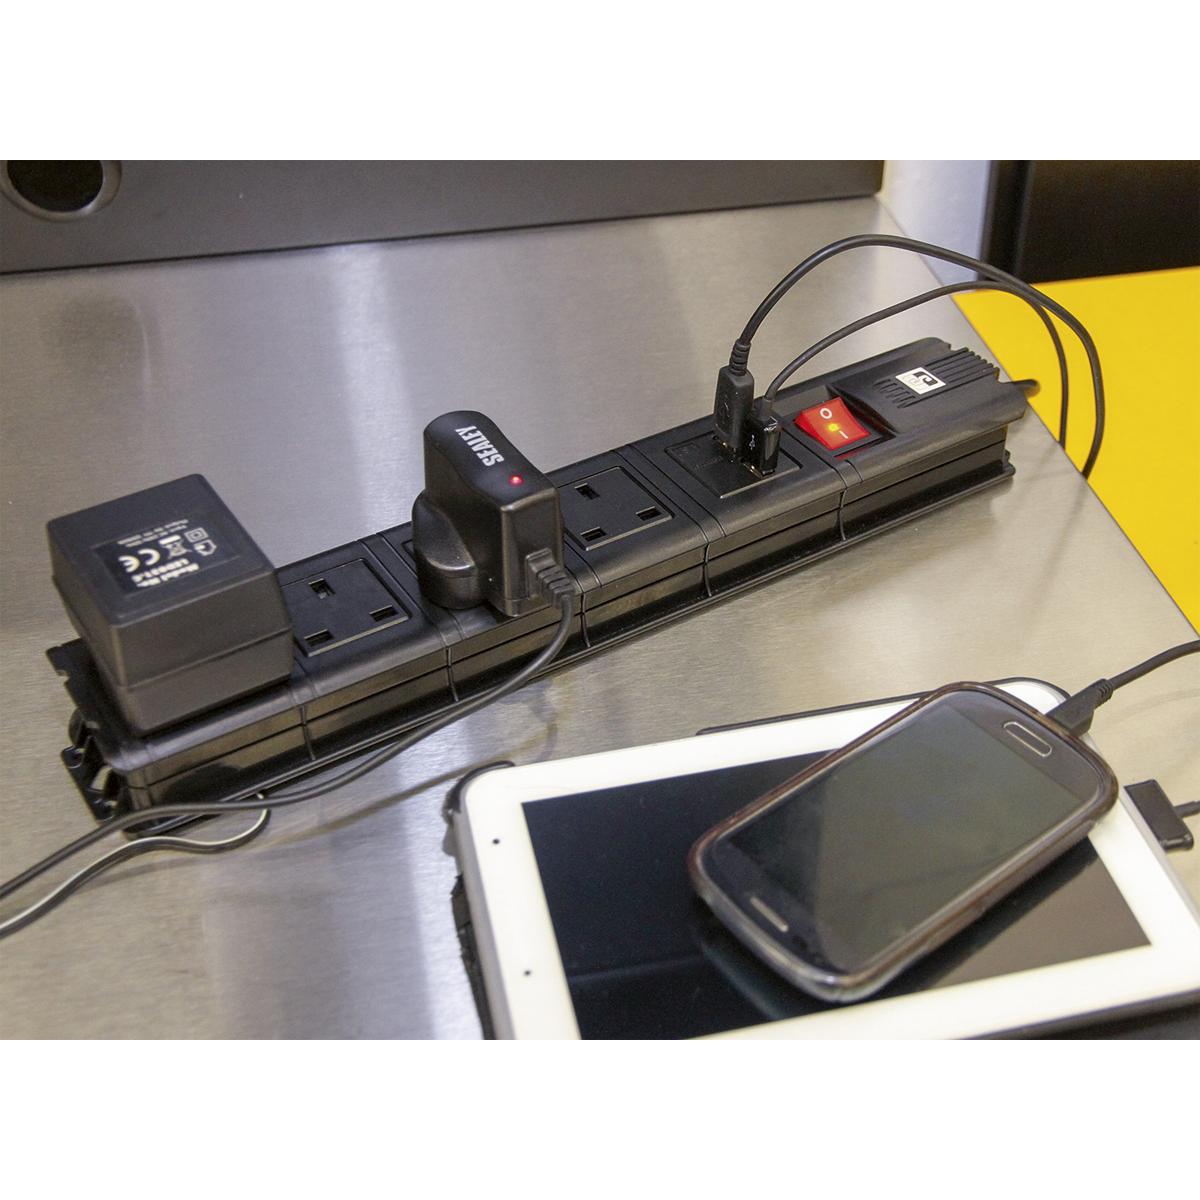 Extension Cable 2.6m 2 x 230V + 2 x USB Sockets - Black